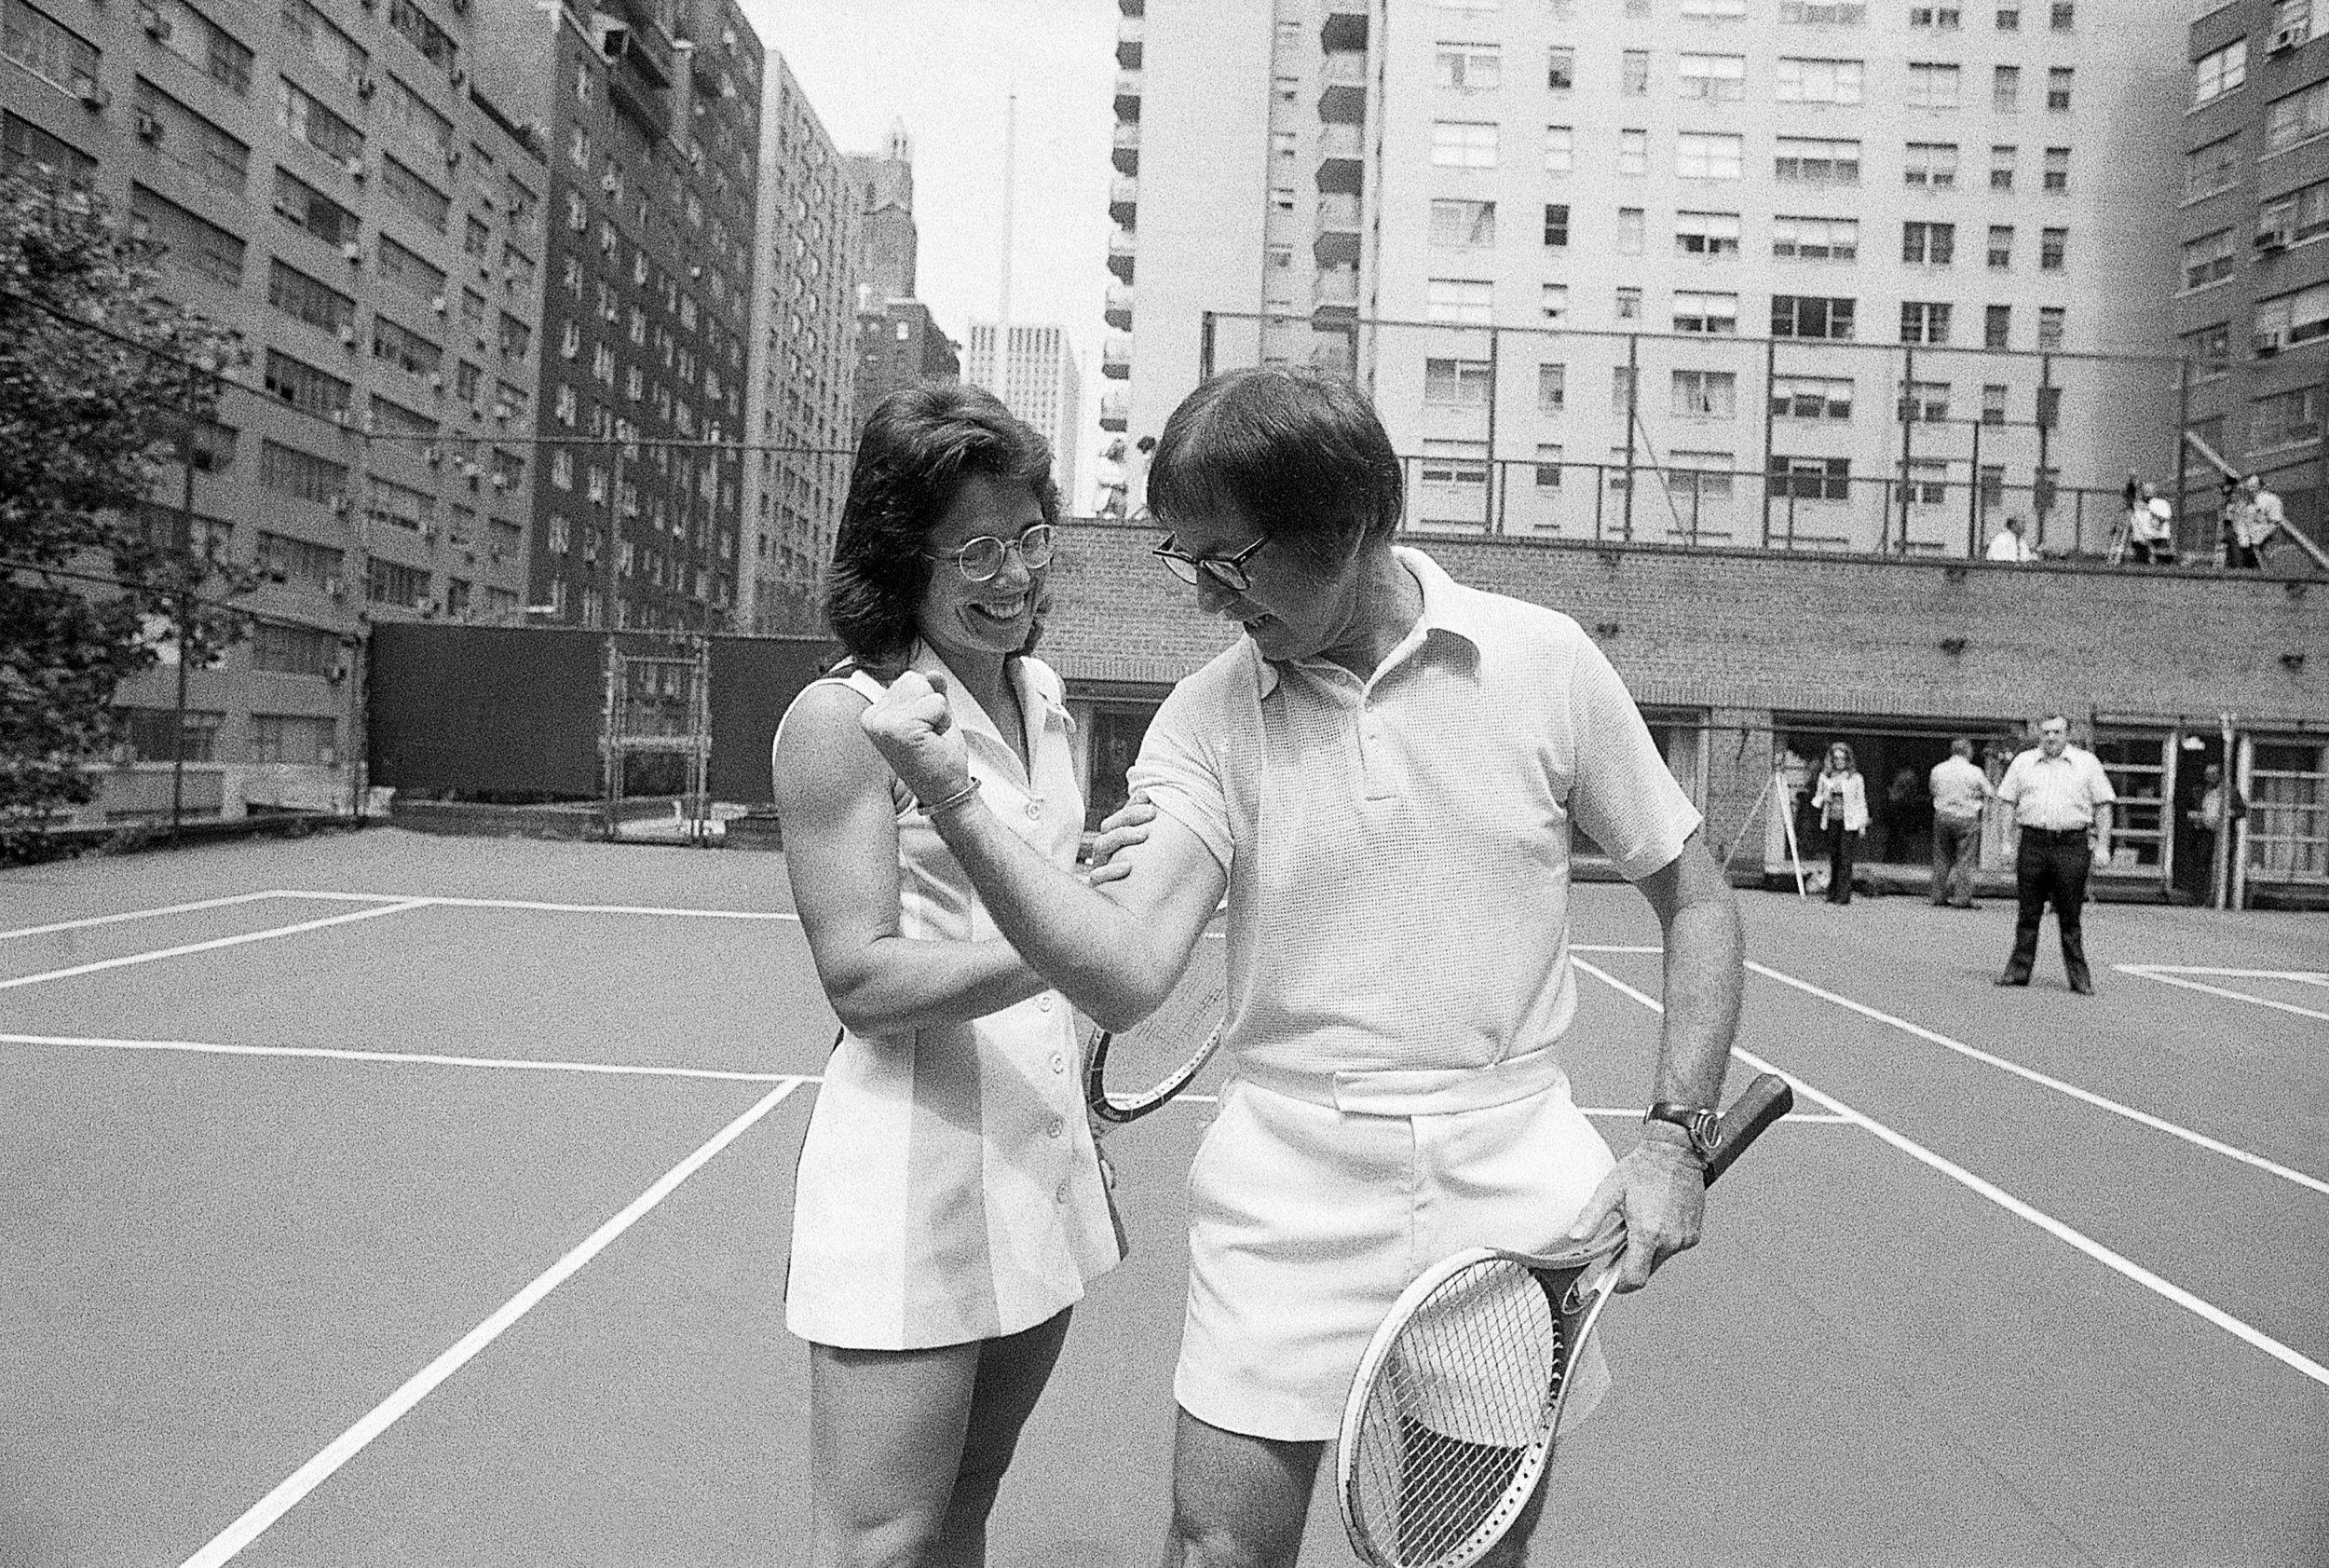 Battle of the sexes tennis pics 91